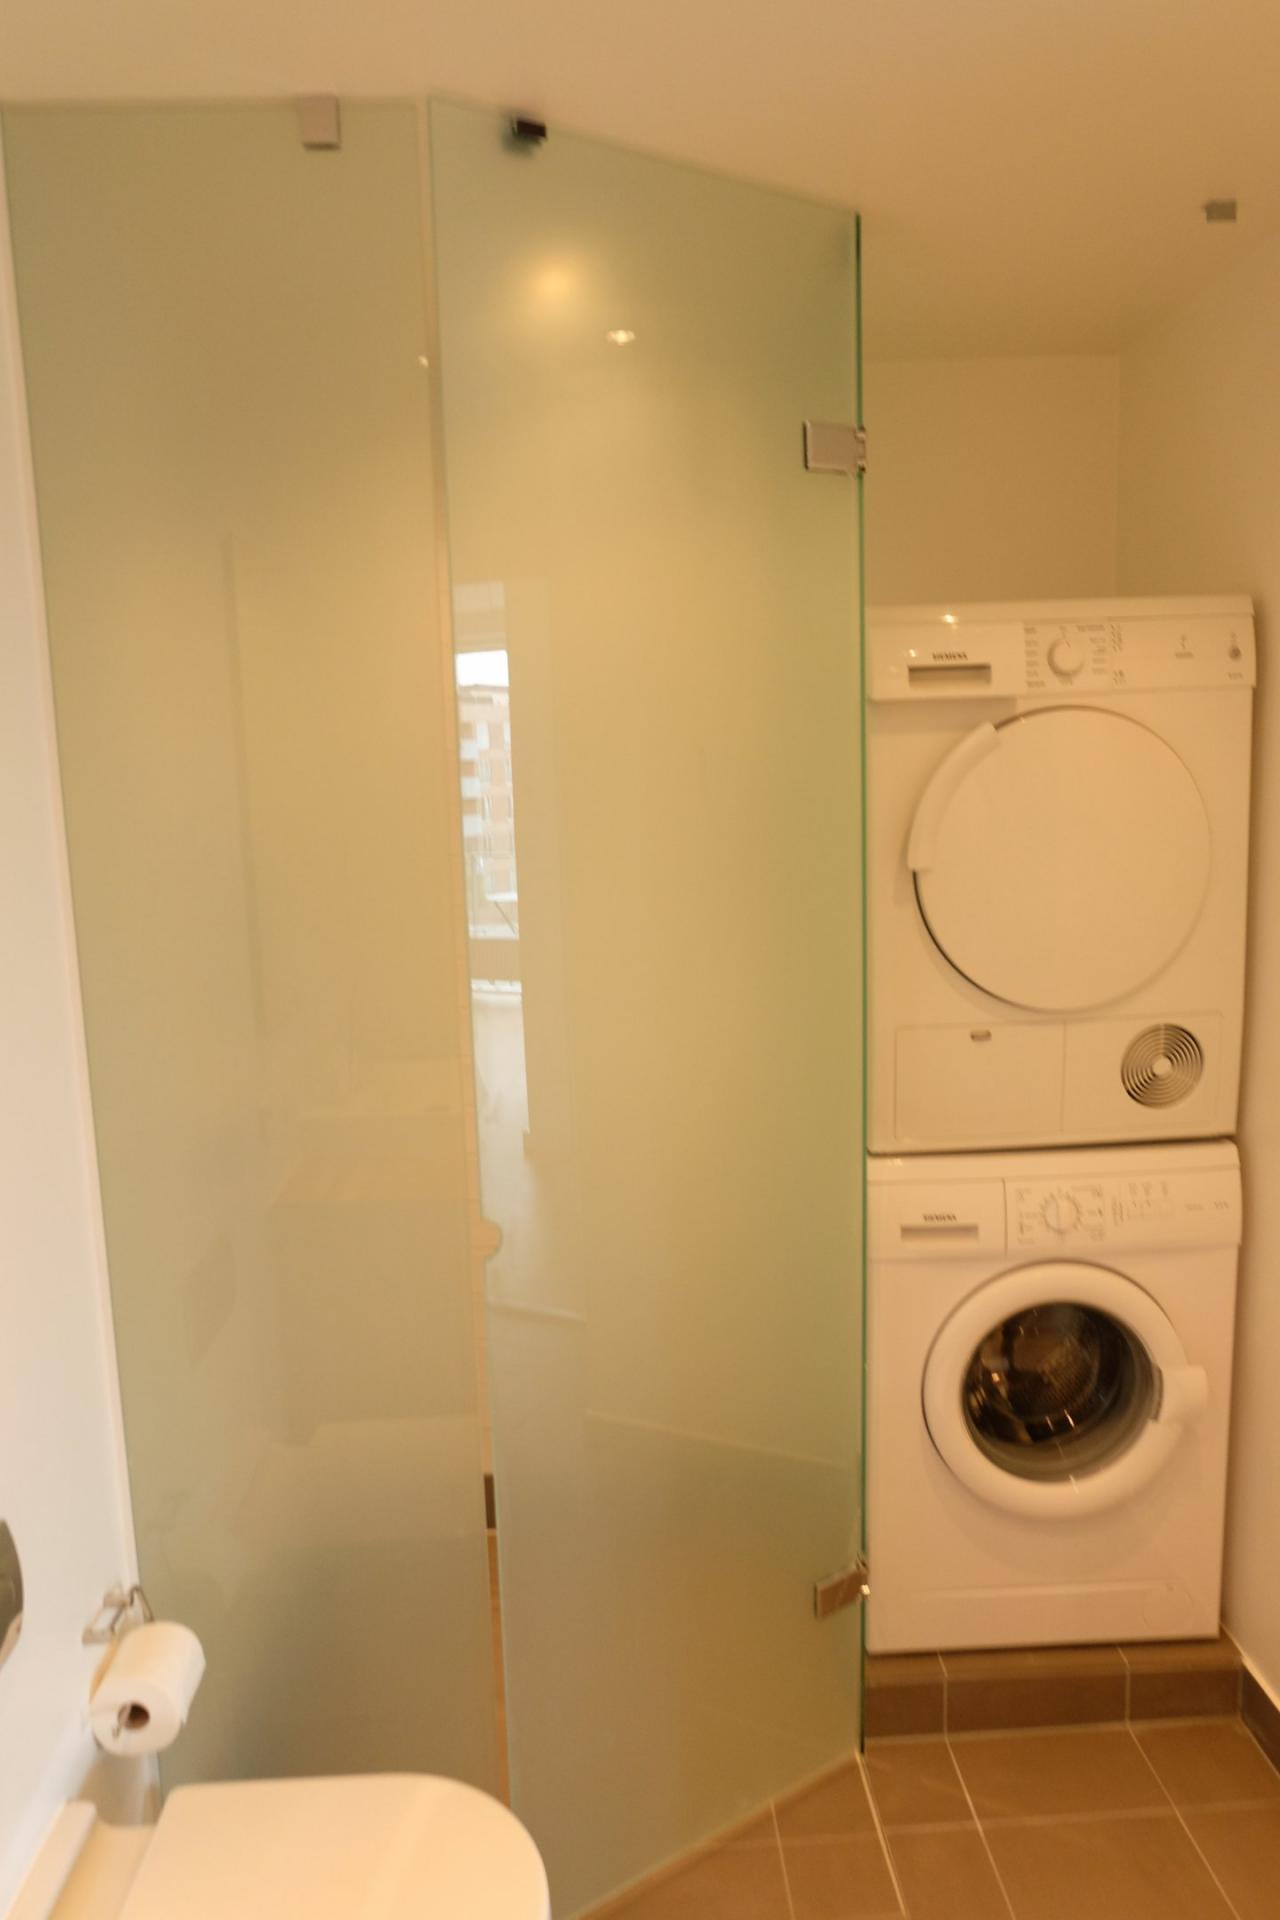 Bathroom at Sluseholmen Apartment, Sydhavnen, Copenhagen